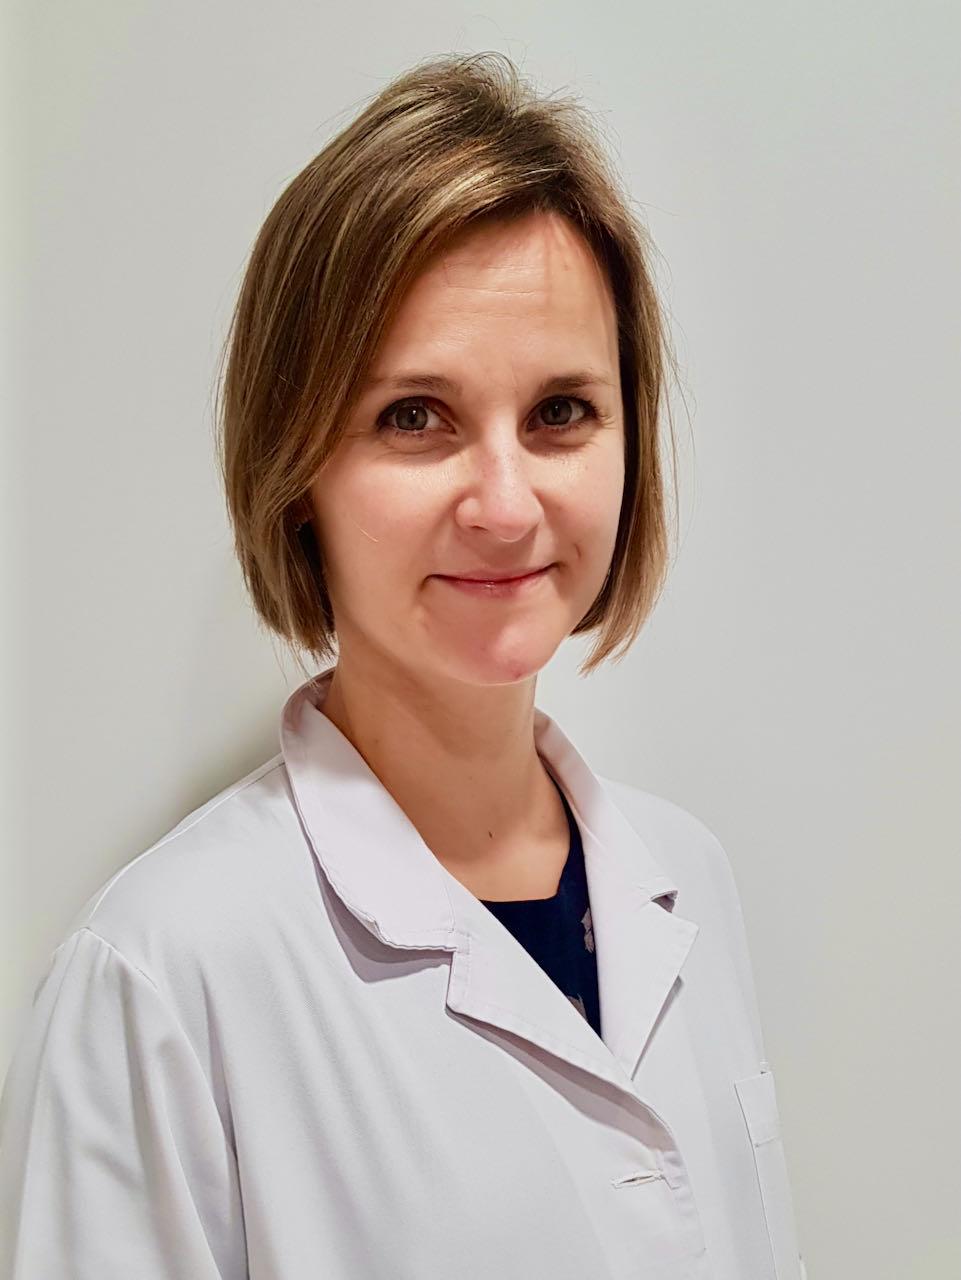 Dra. Marta Zielonka